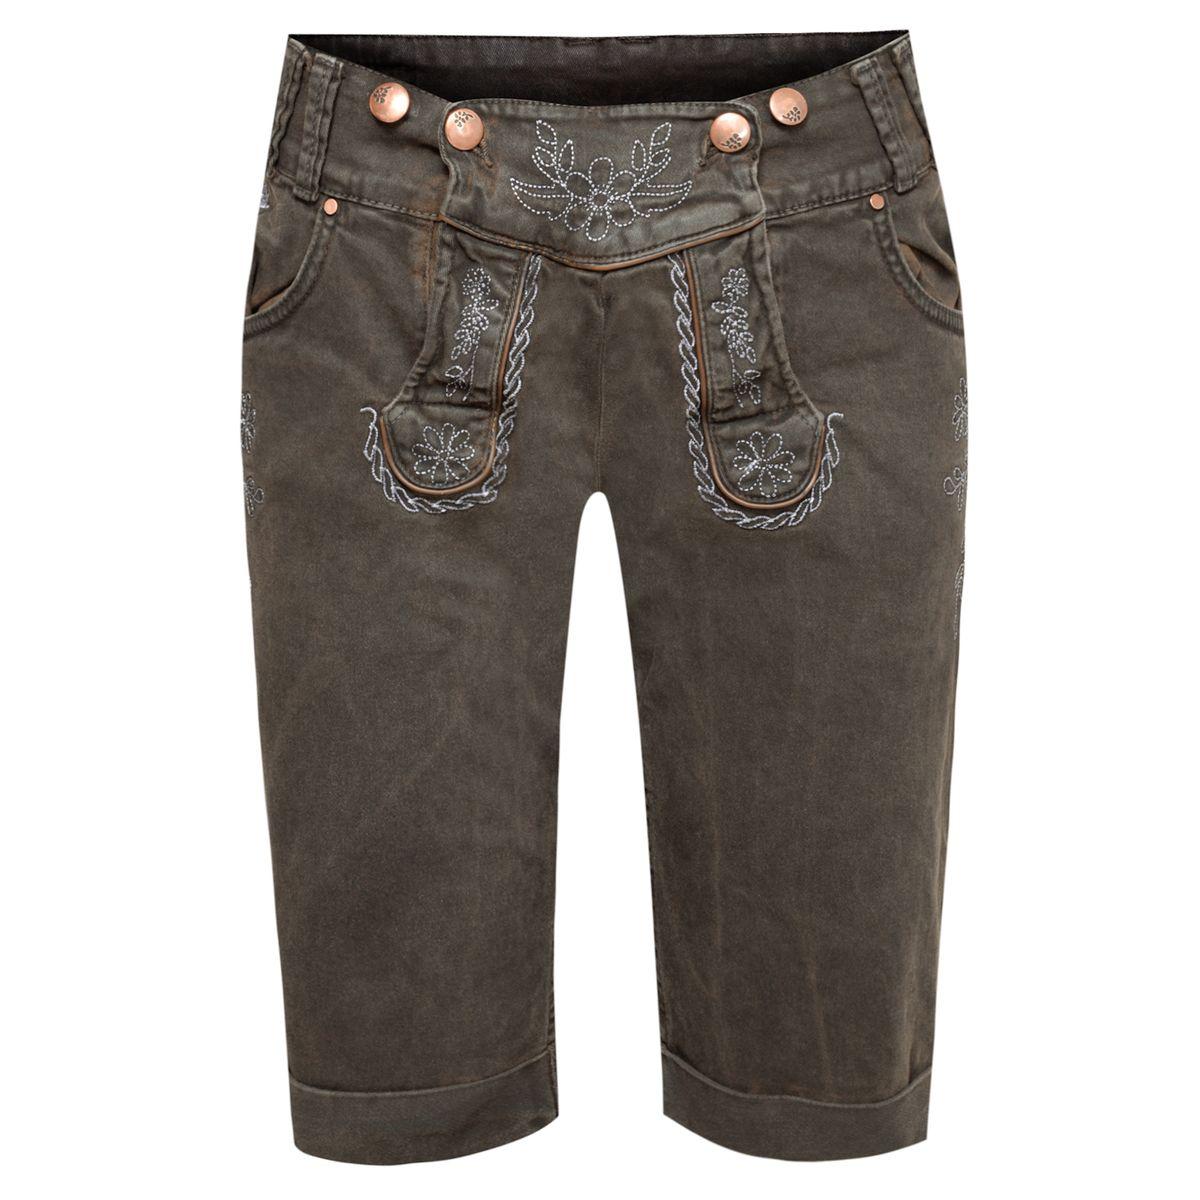 Jeans-Lederhose Bermuda in Dunkelbraun von Hangowear